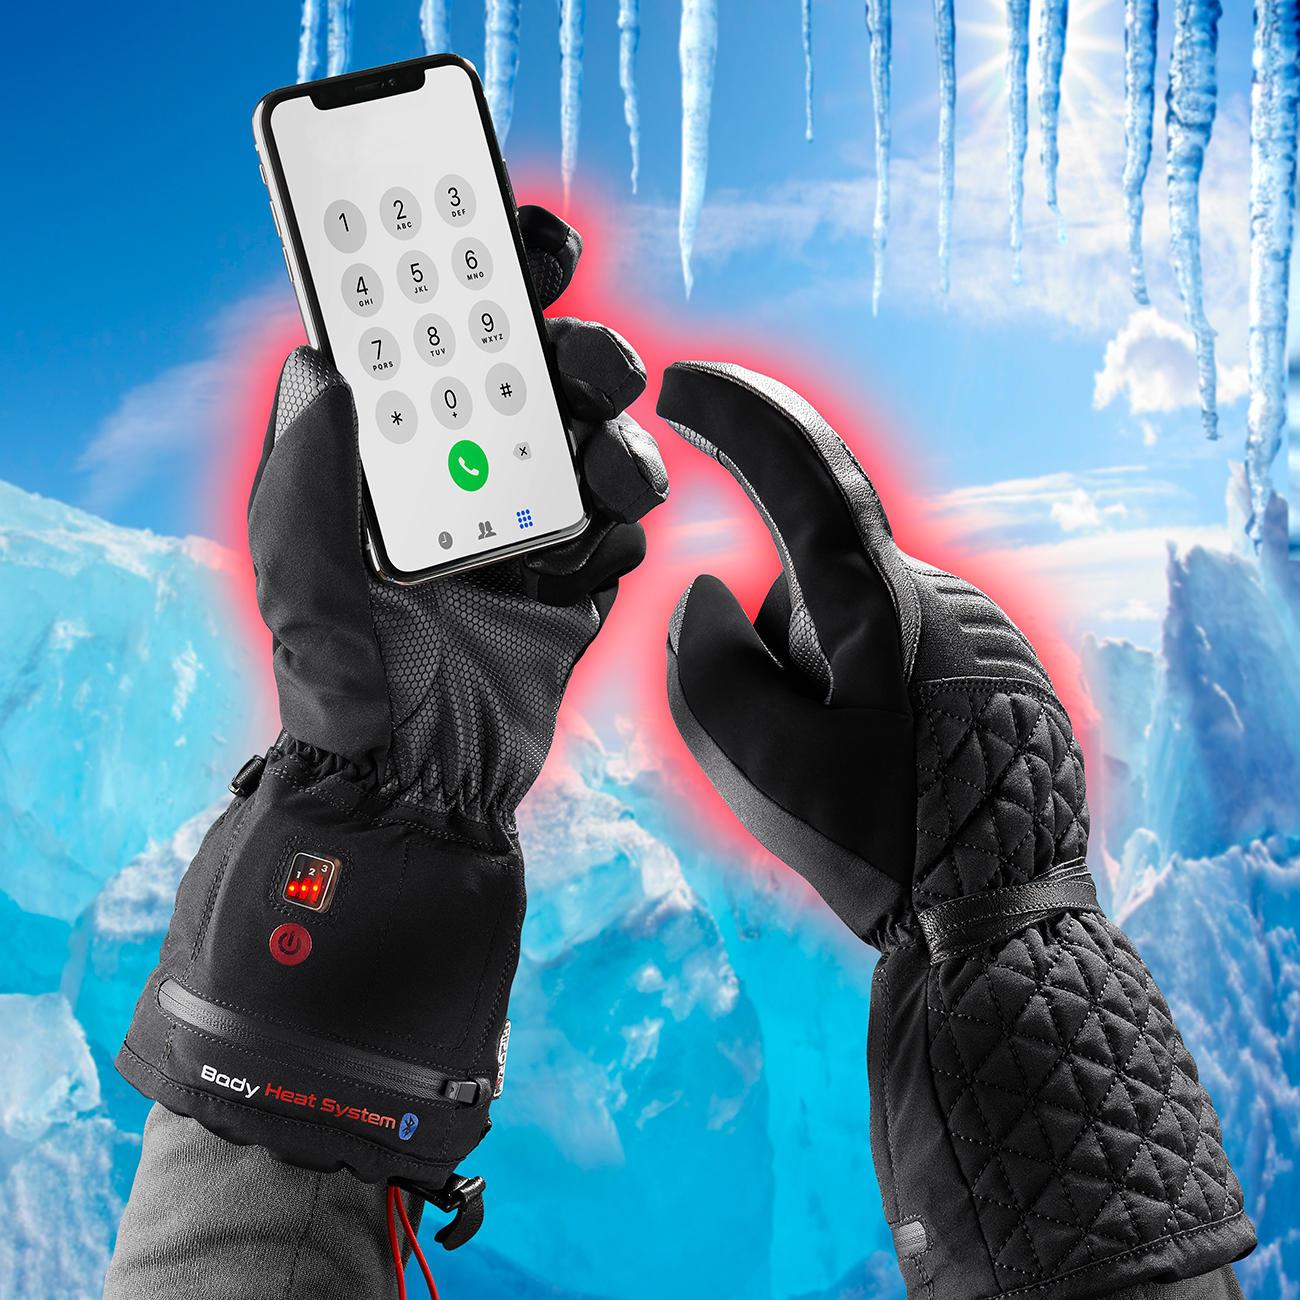 Heatable Winter Gloves | 3-year product guarantee